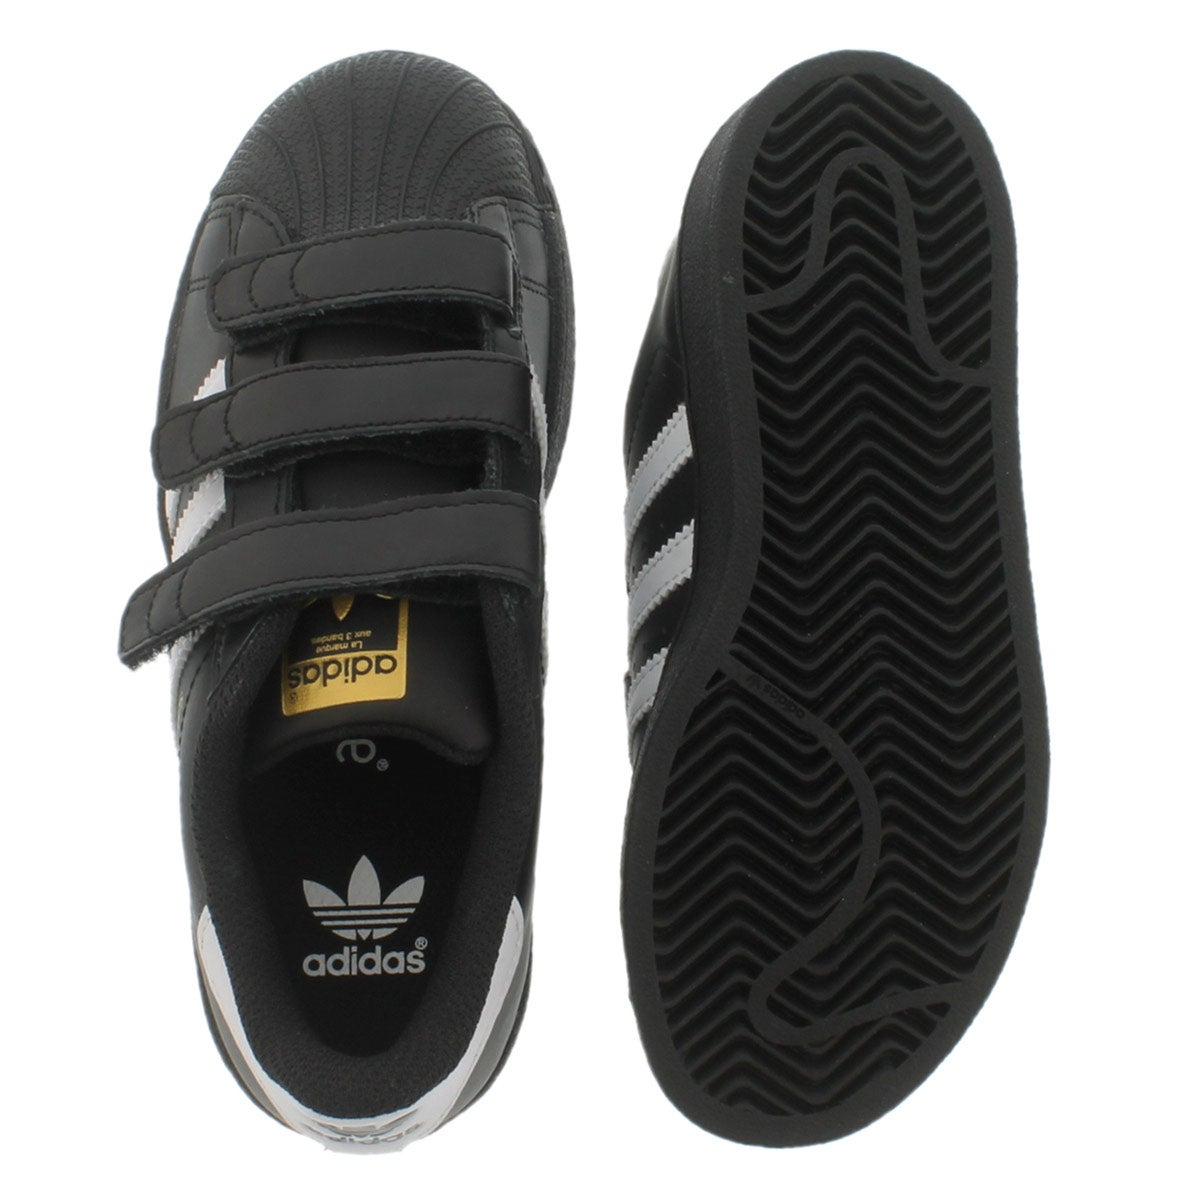 Bys Superstar Foundation blk/wht sneaker